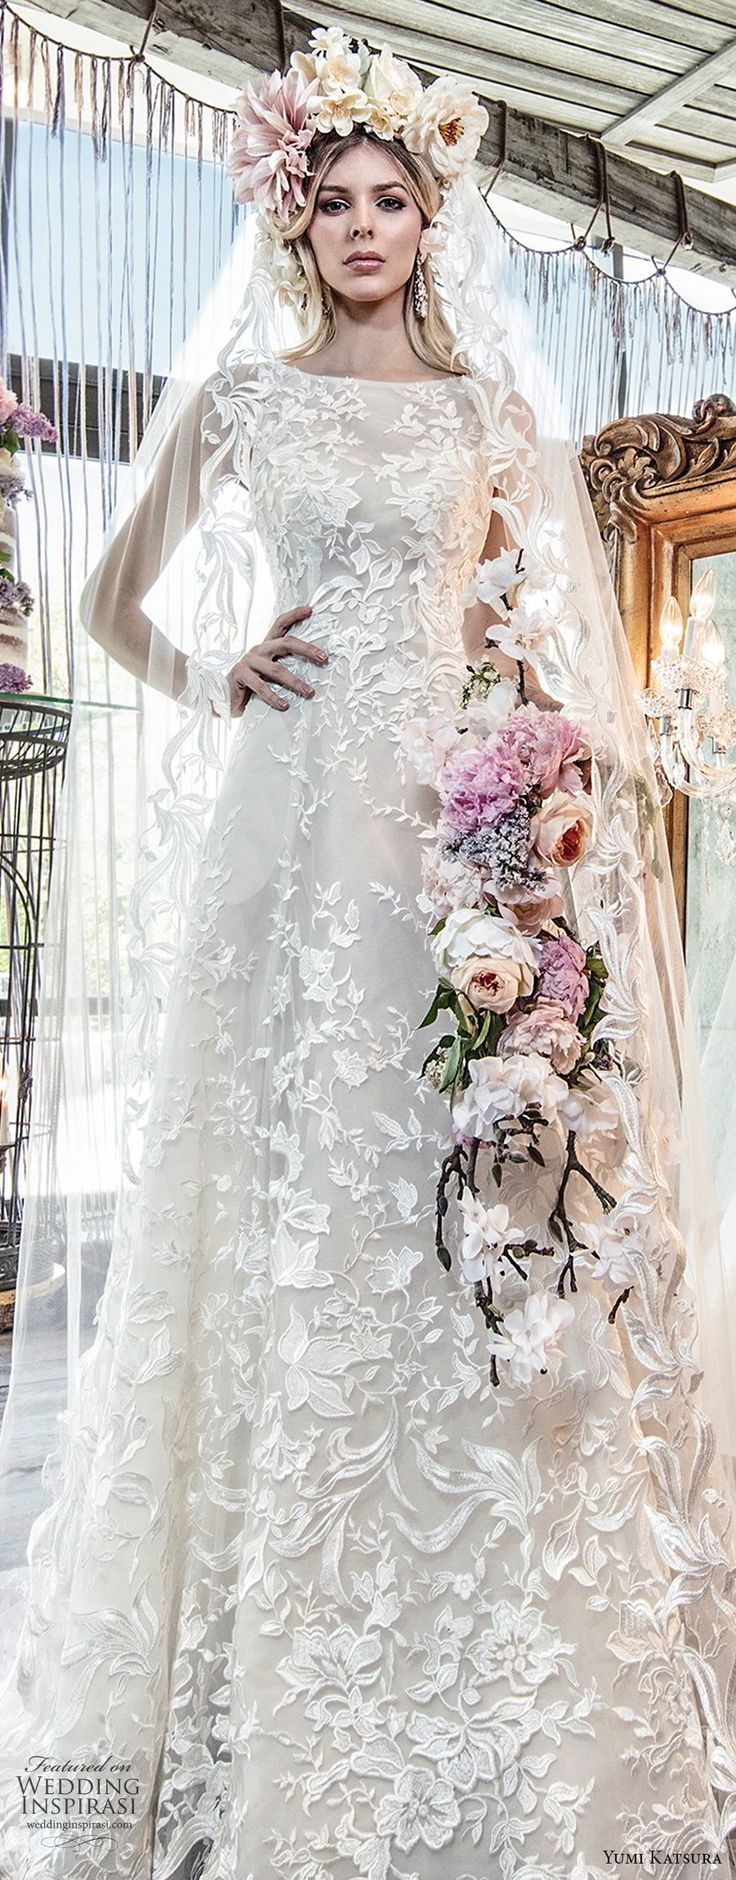 5733 best Brautkleider images on Pinterest | Wedding frocks, Short ...